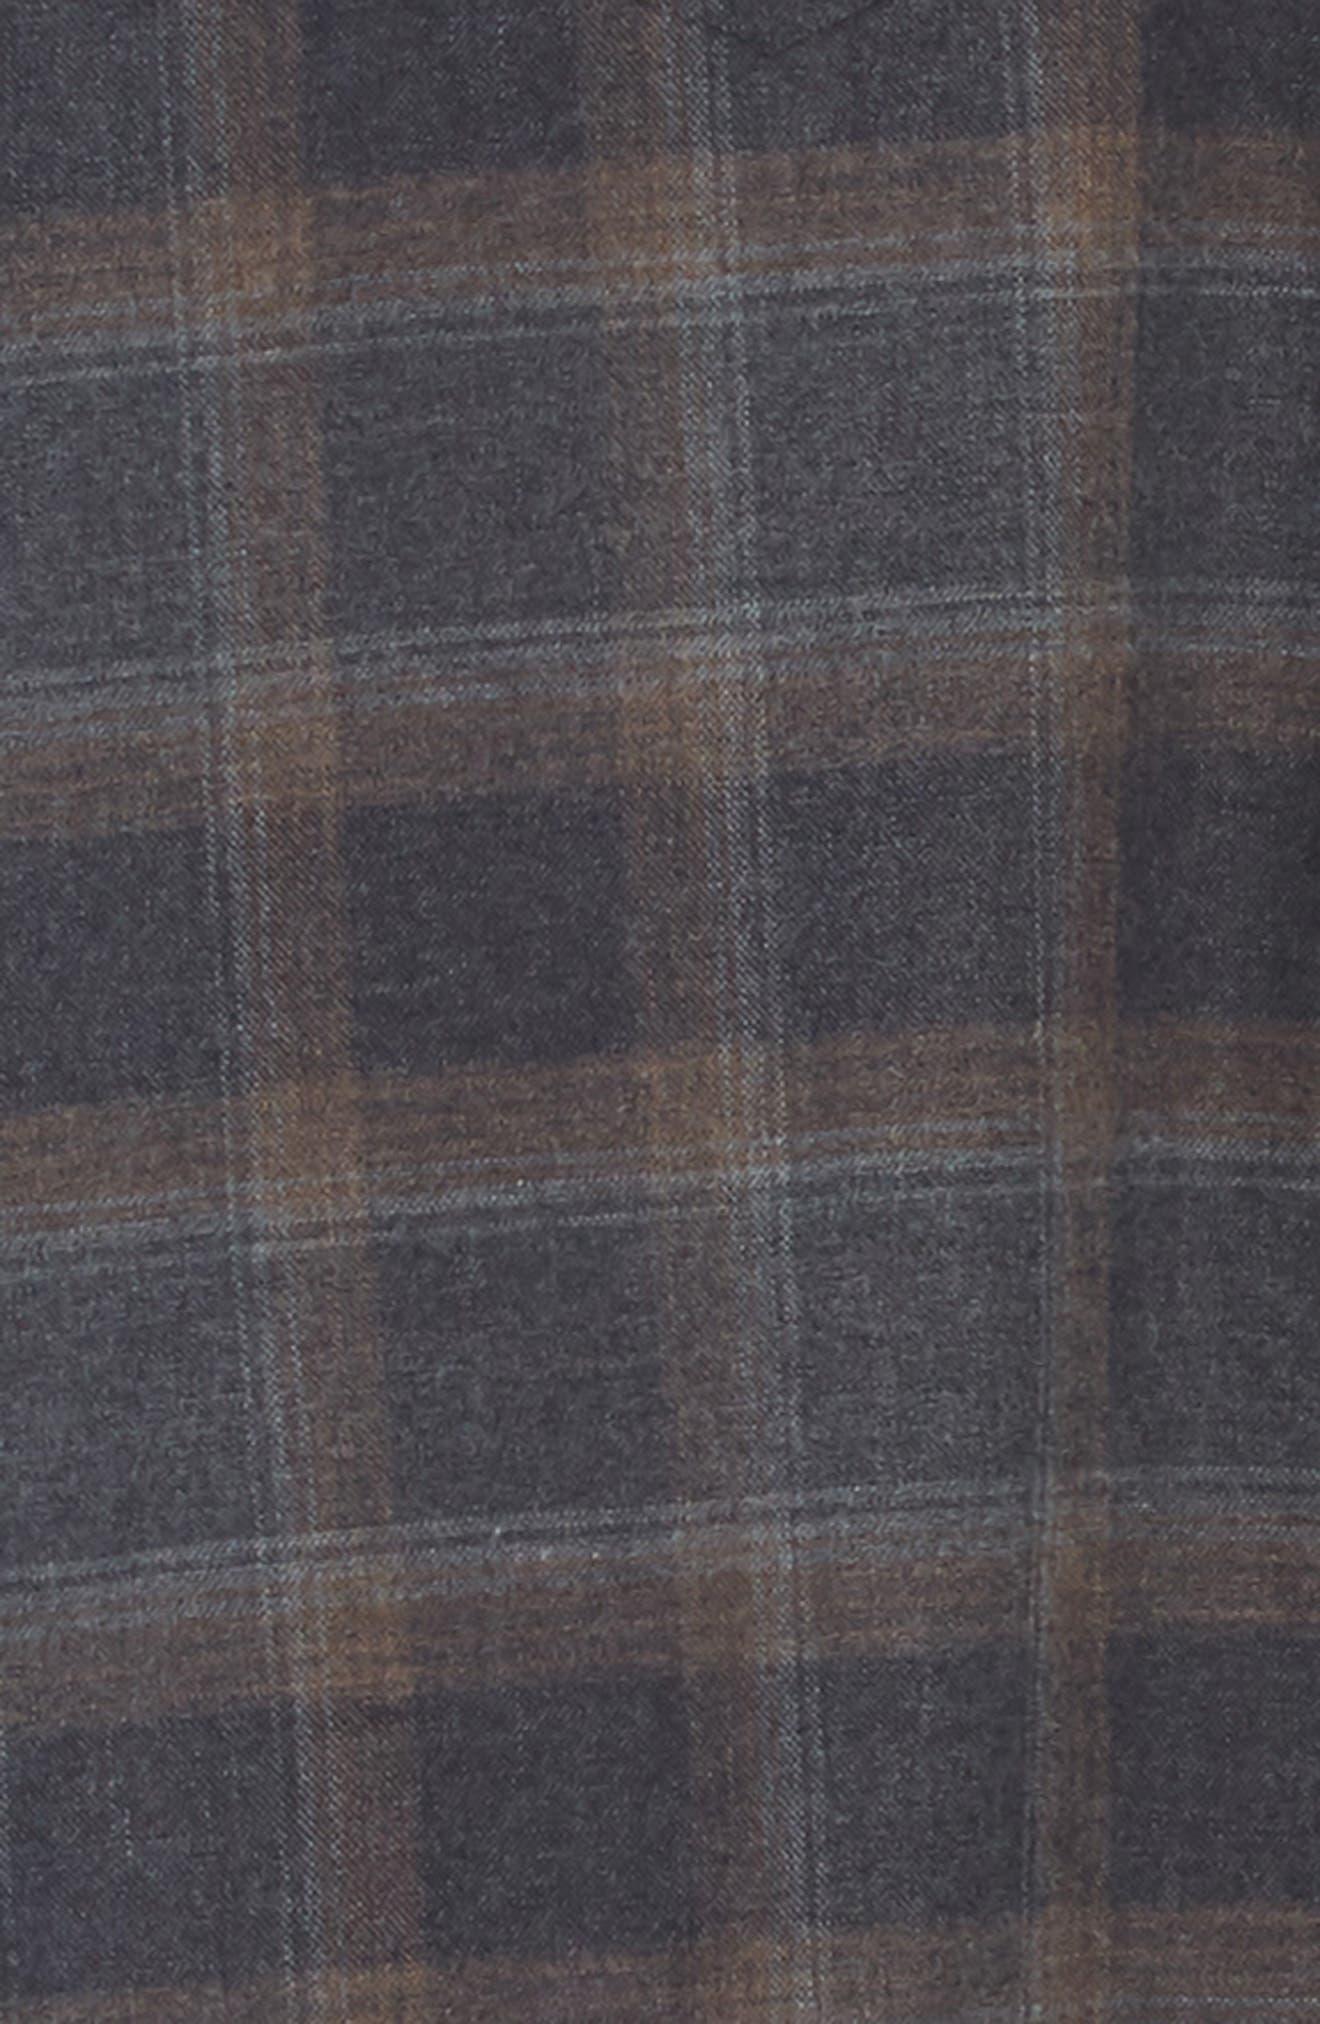 Slim Fit Plaid Western Shirt,                             Alternate thumbnail 3, color,                             Grey/ Brown